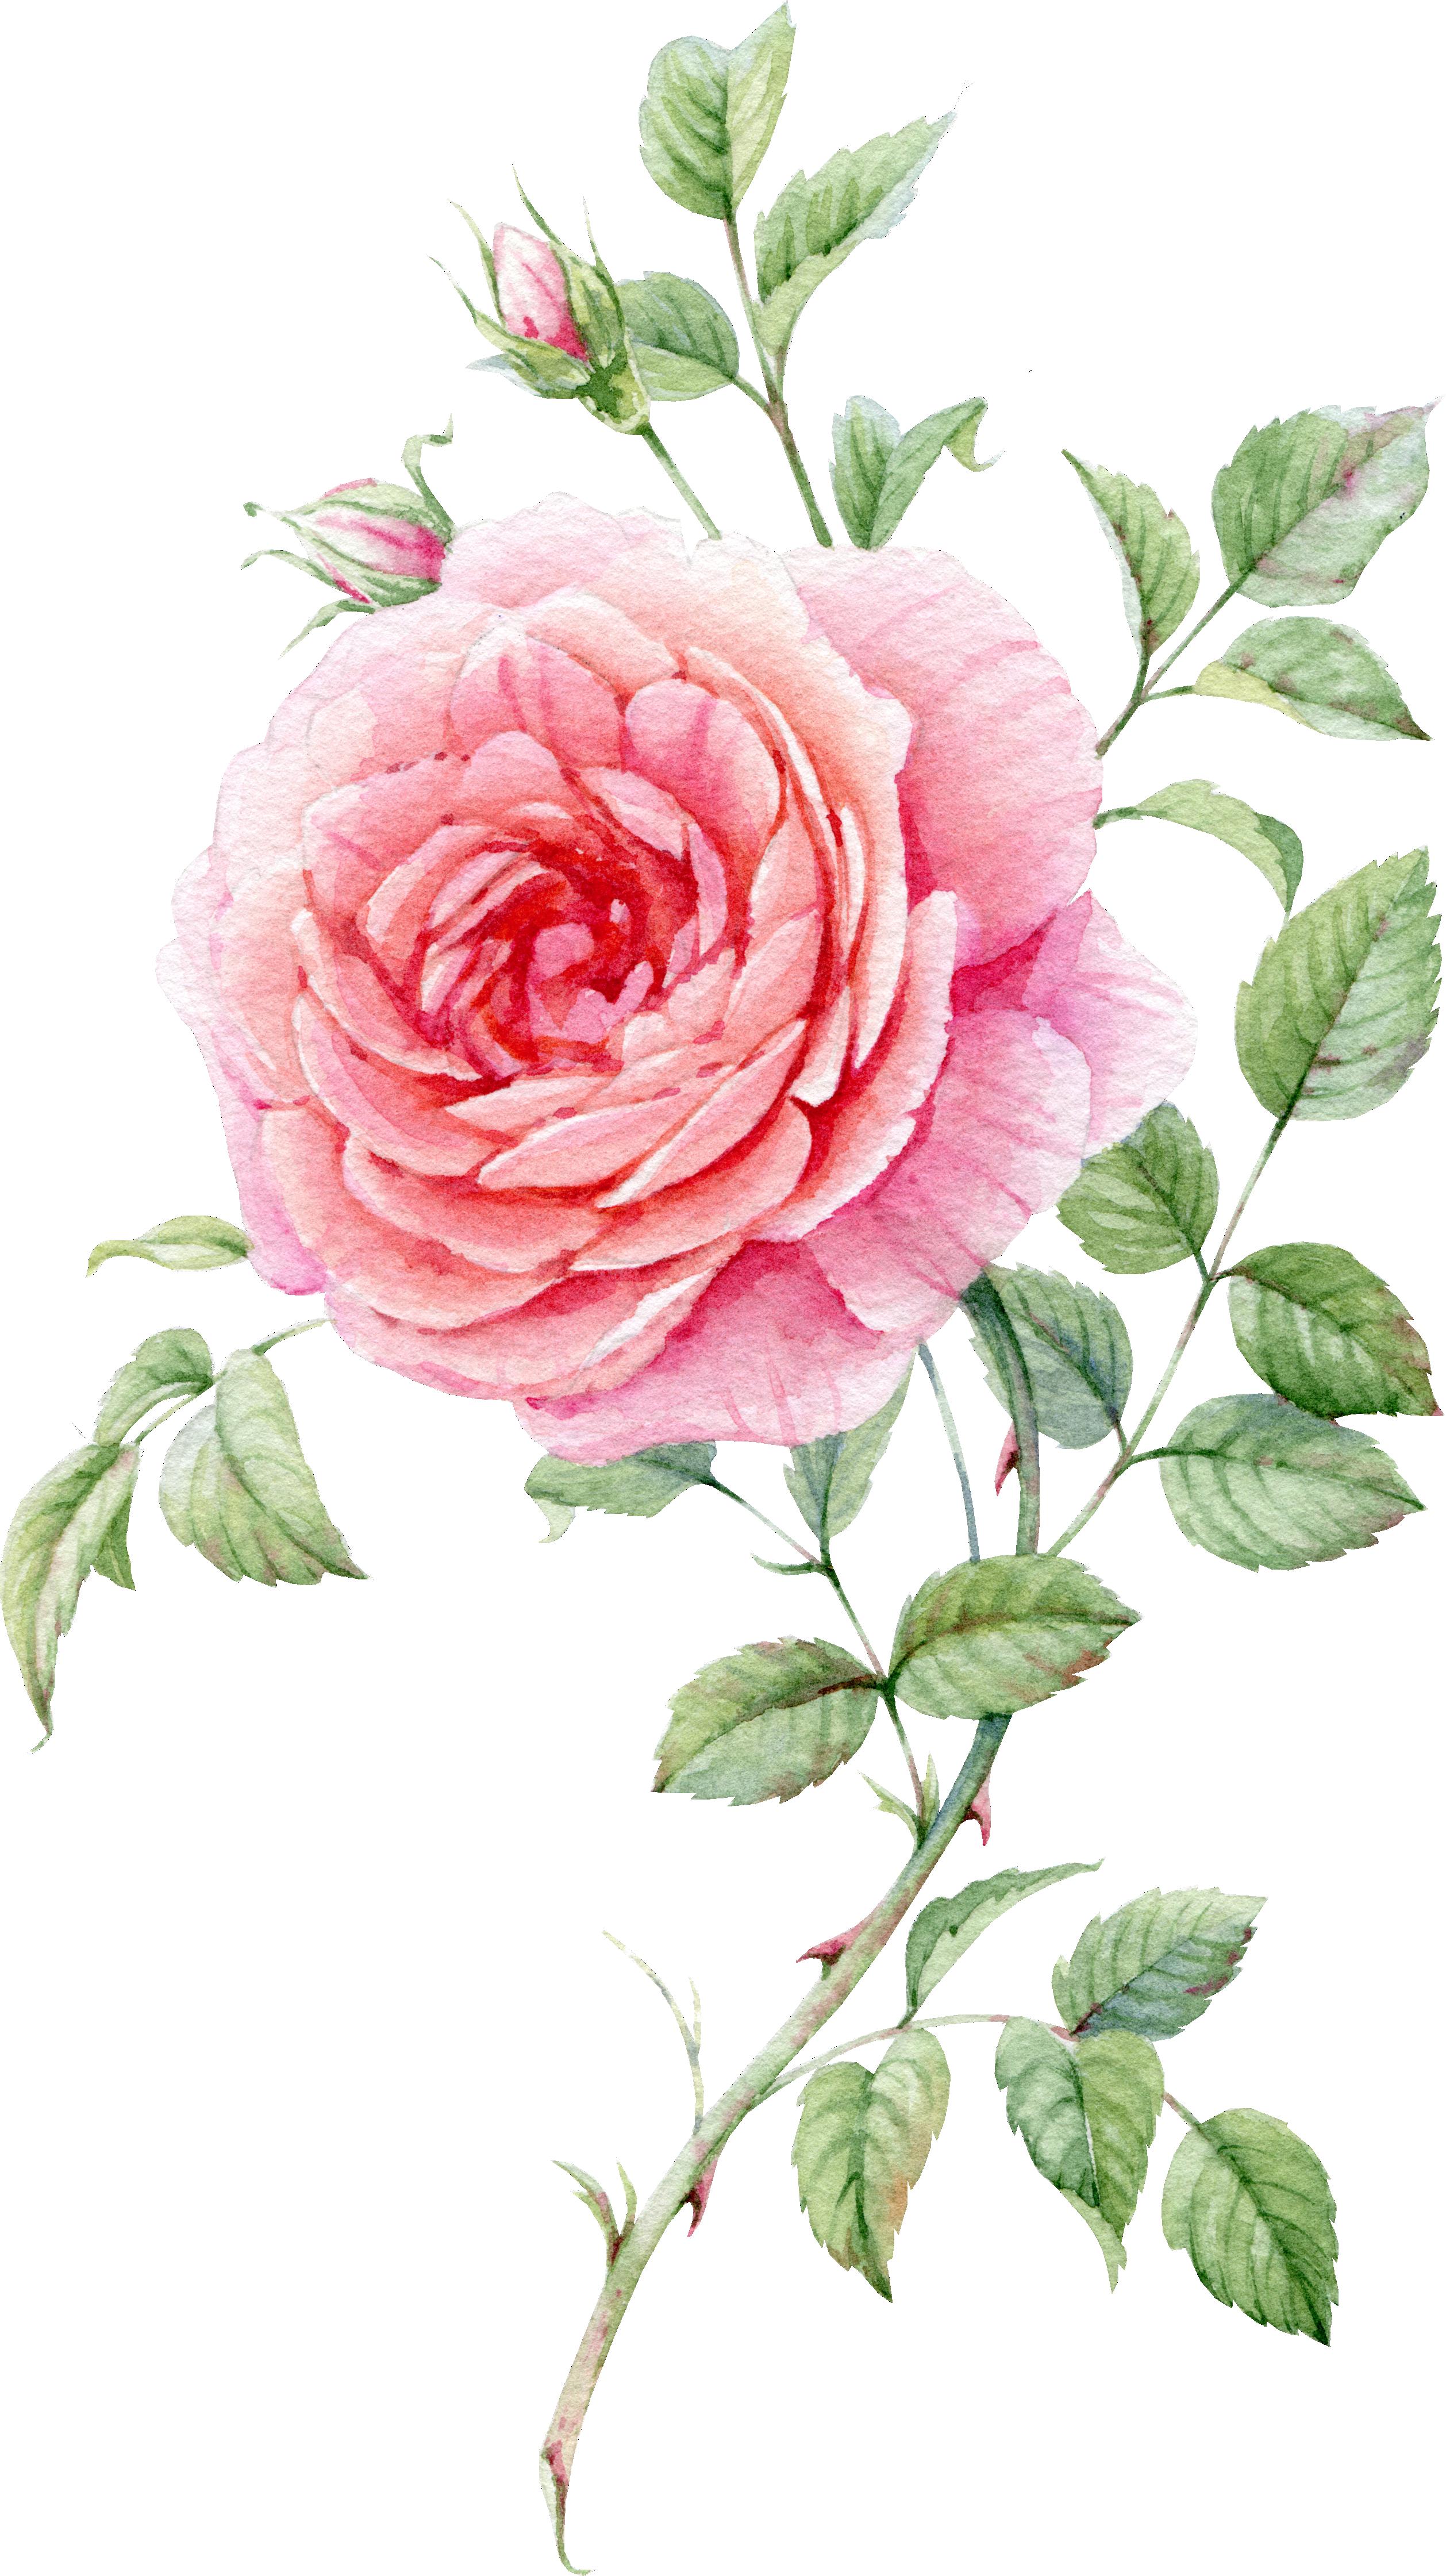 Pin by Harun Khan on flower latest   Flower drawing, Rose drawing, Flower art